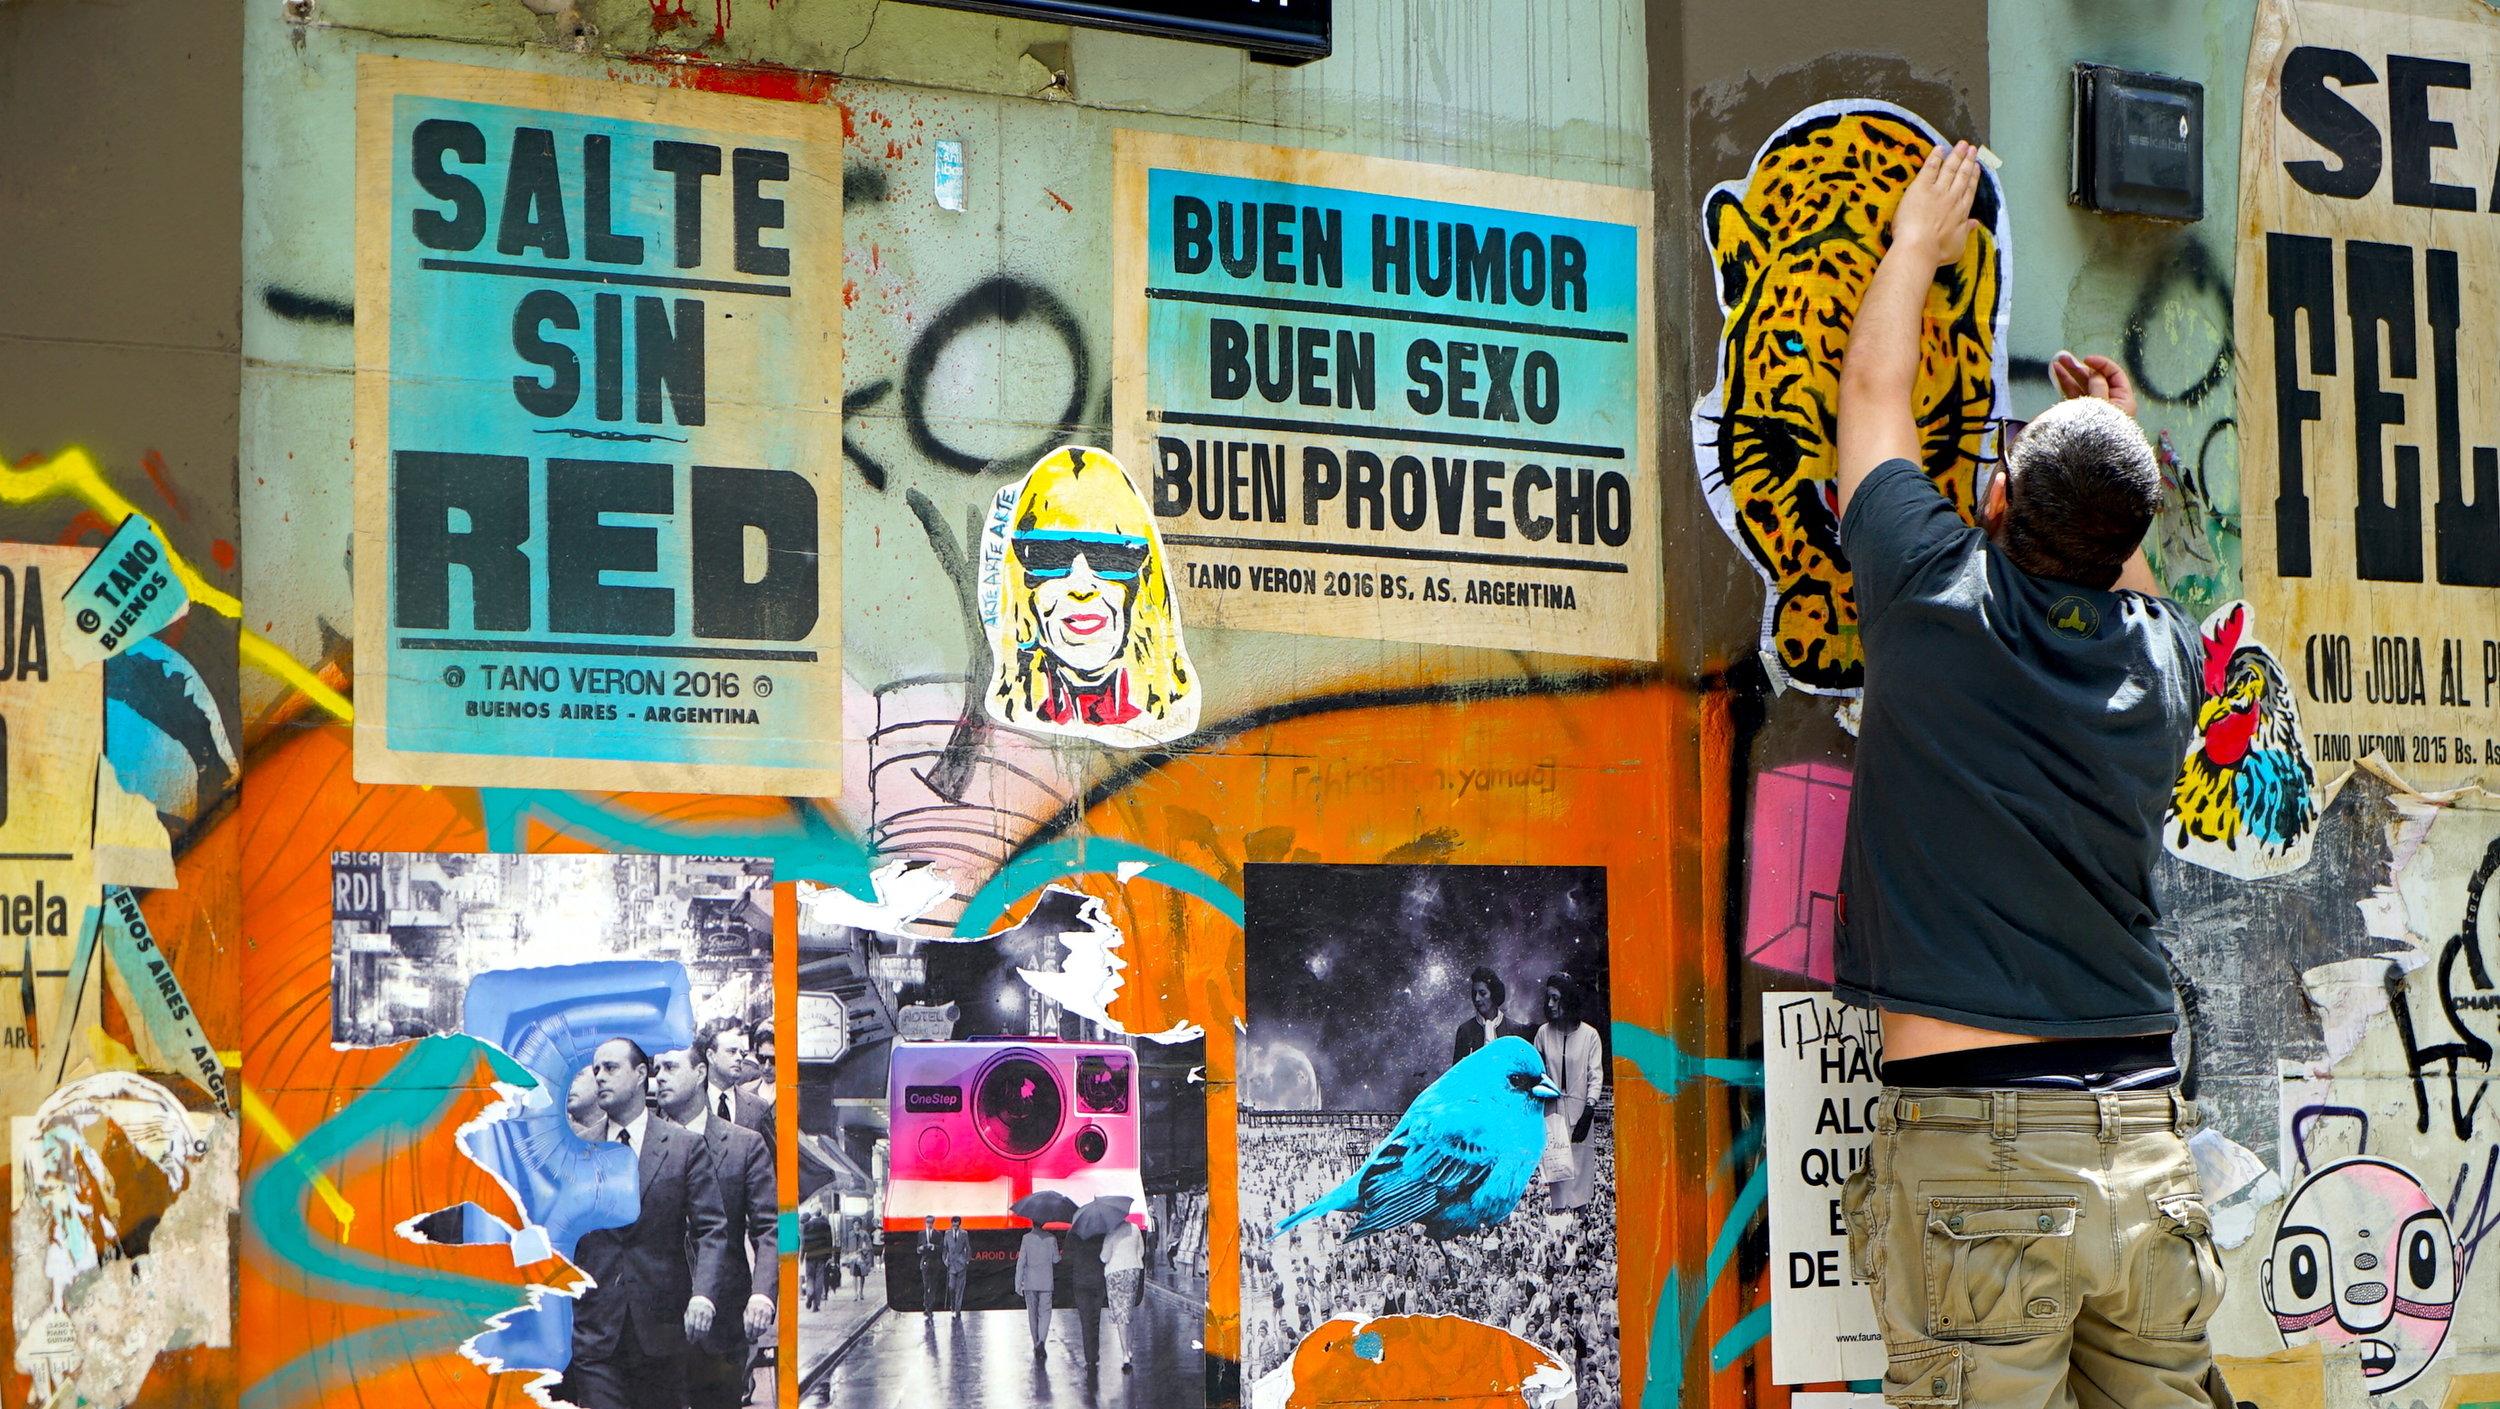 Palermo (26.01.17)